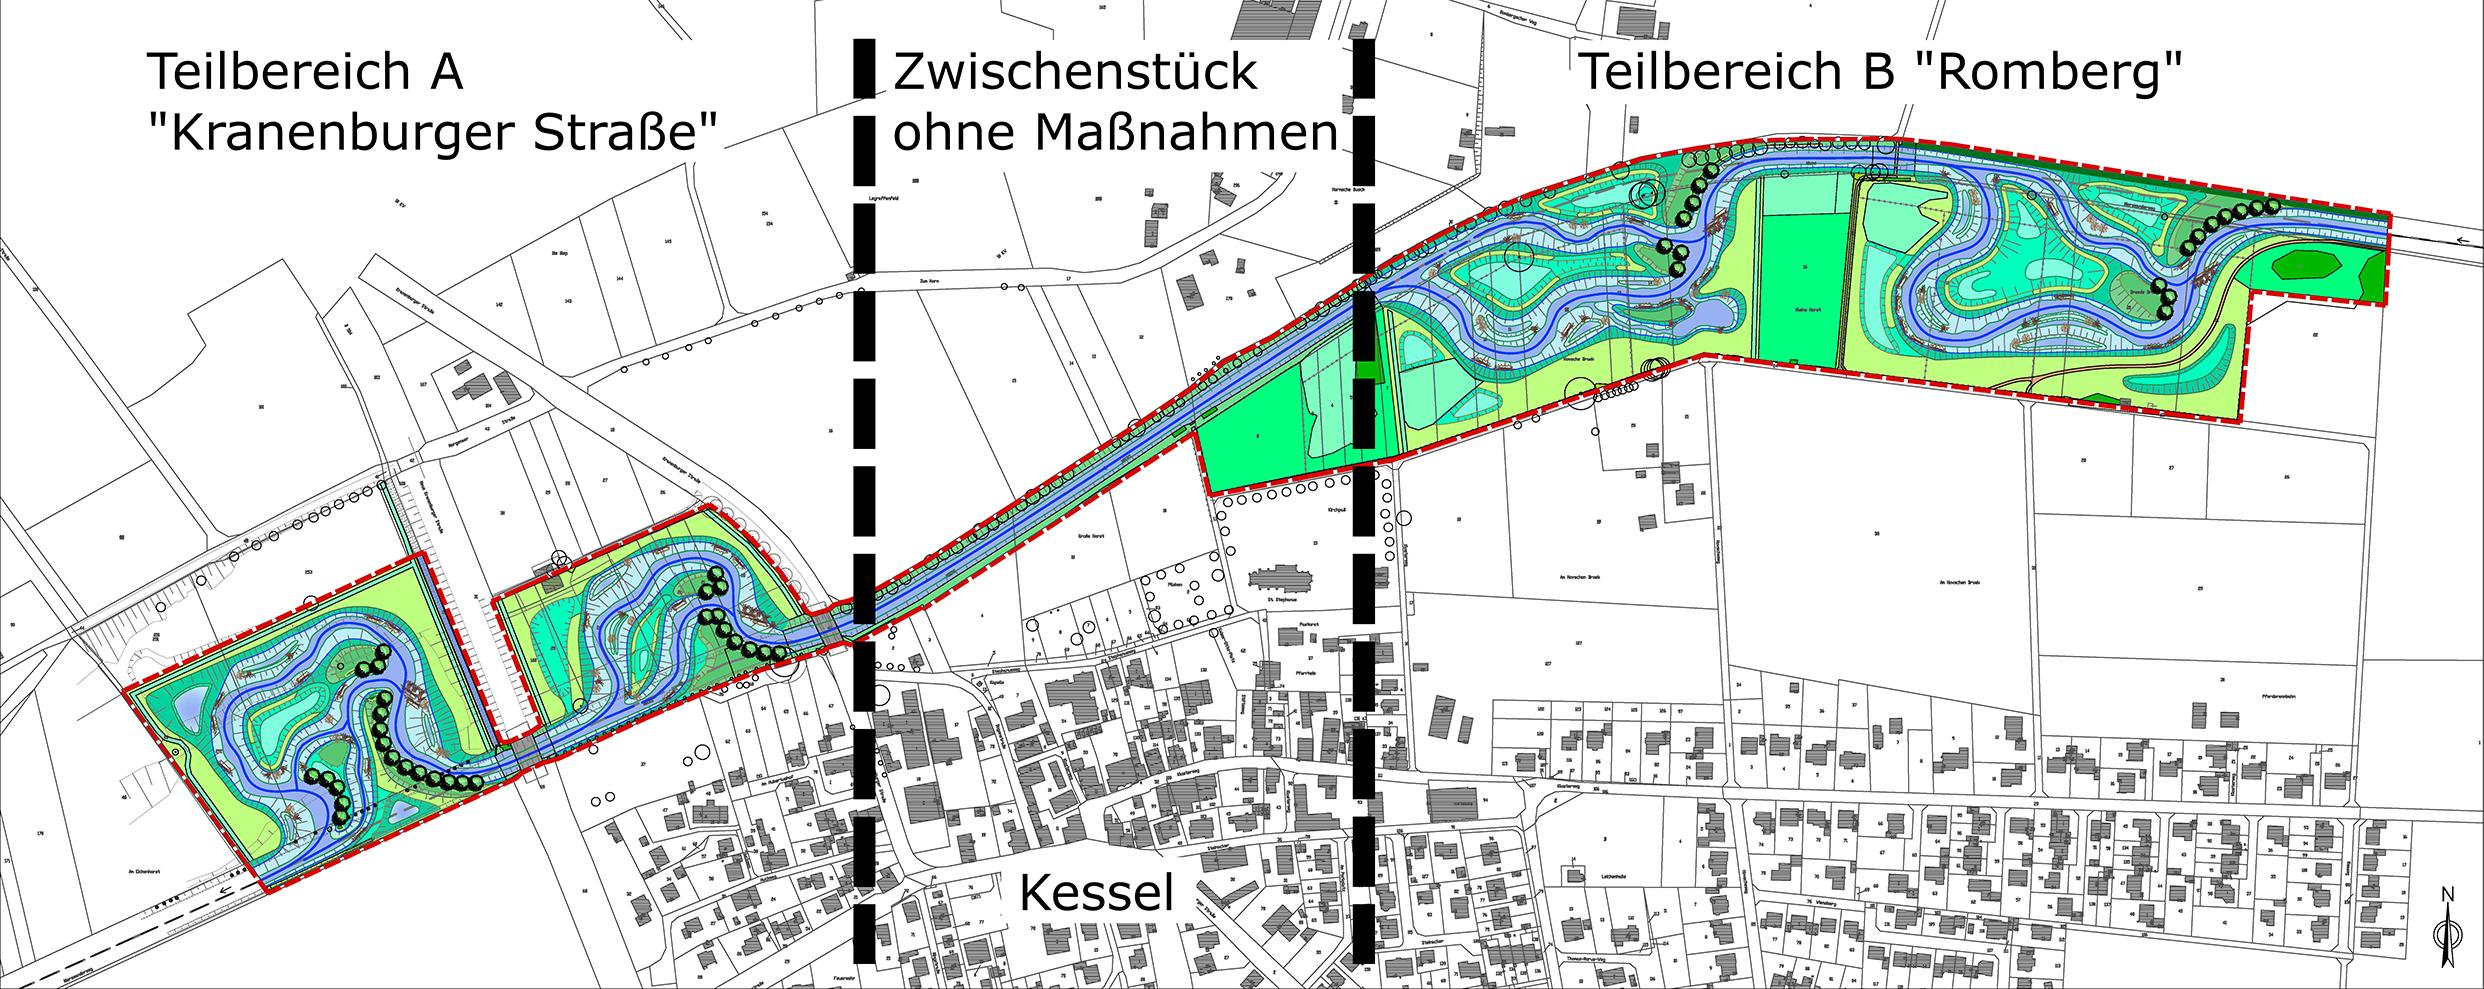 Niersverband: 23. Januar 2018 - Bauarbeiten an der Niers in Kessel ...